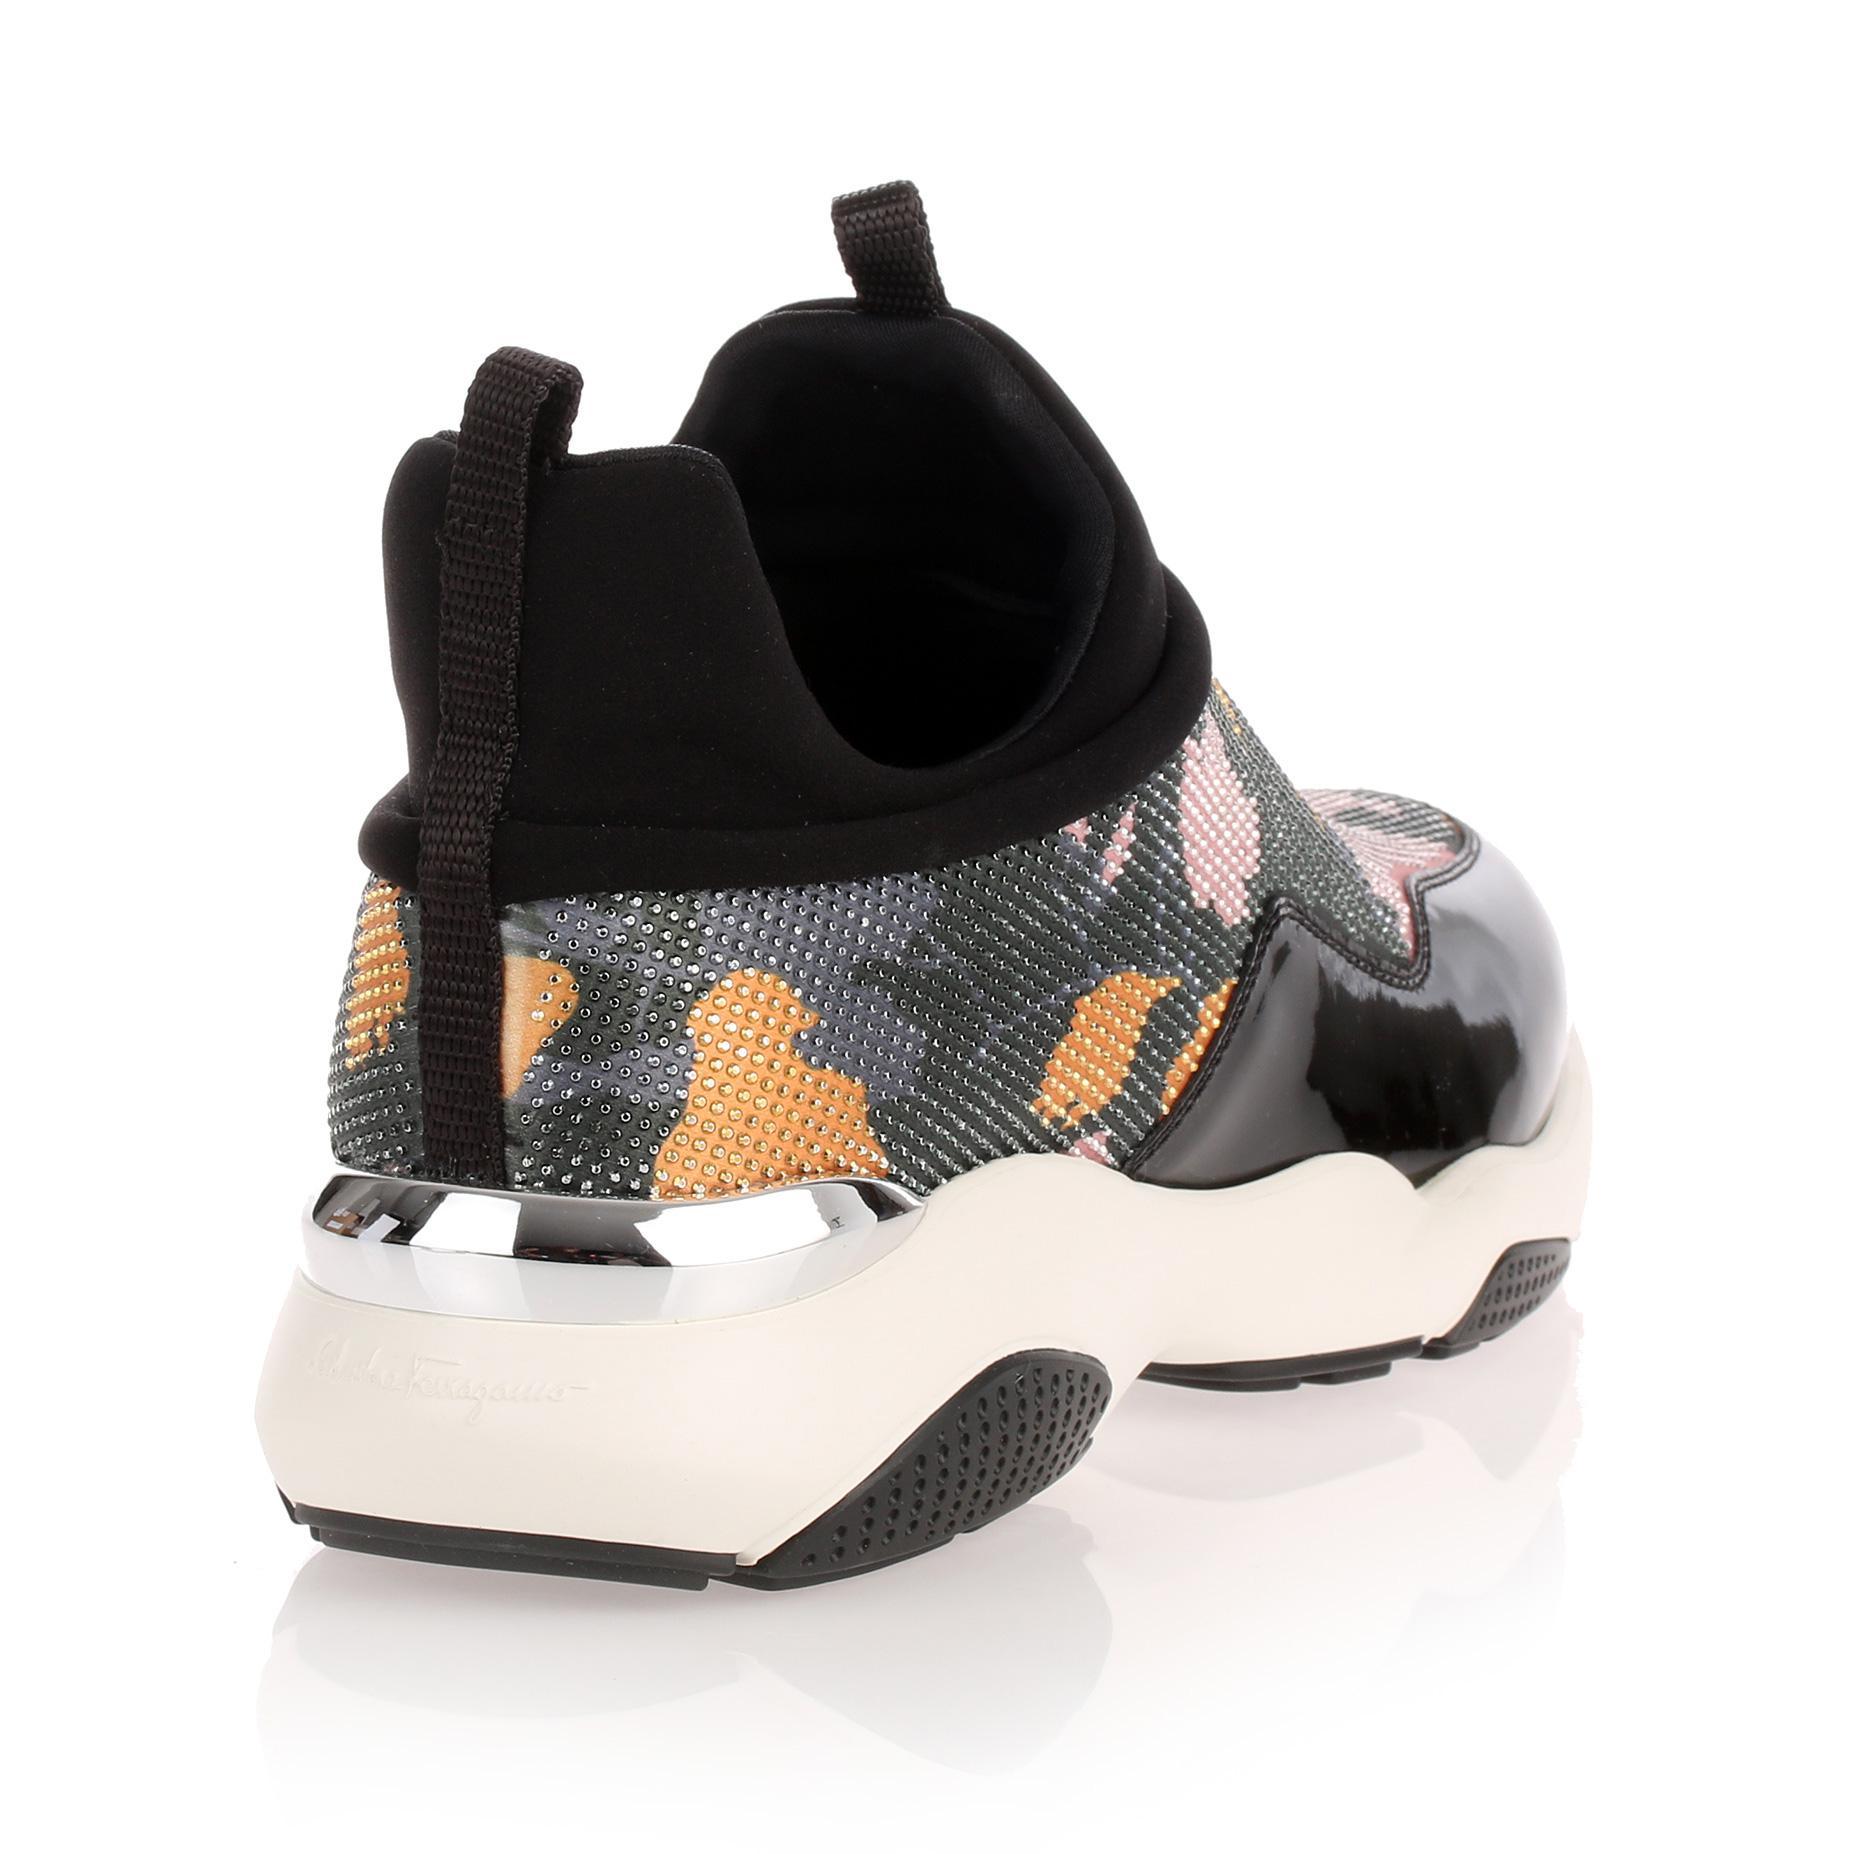 Giolly patent haiti black sneaker Salvatore Ferragamo Qoor4bk